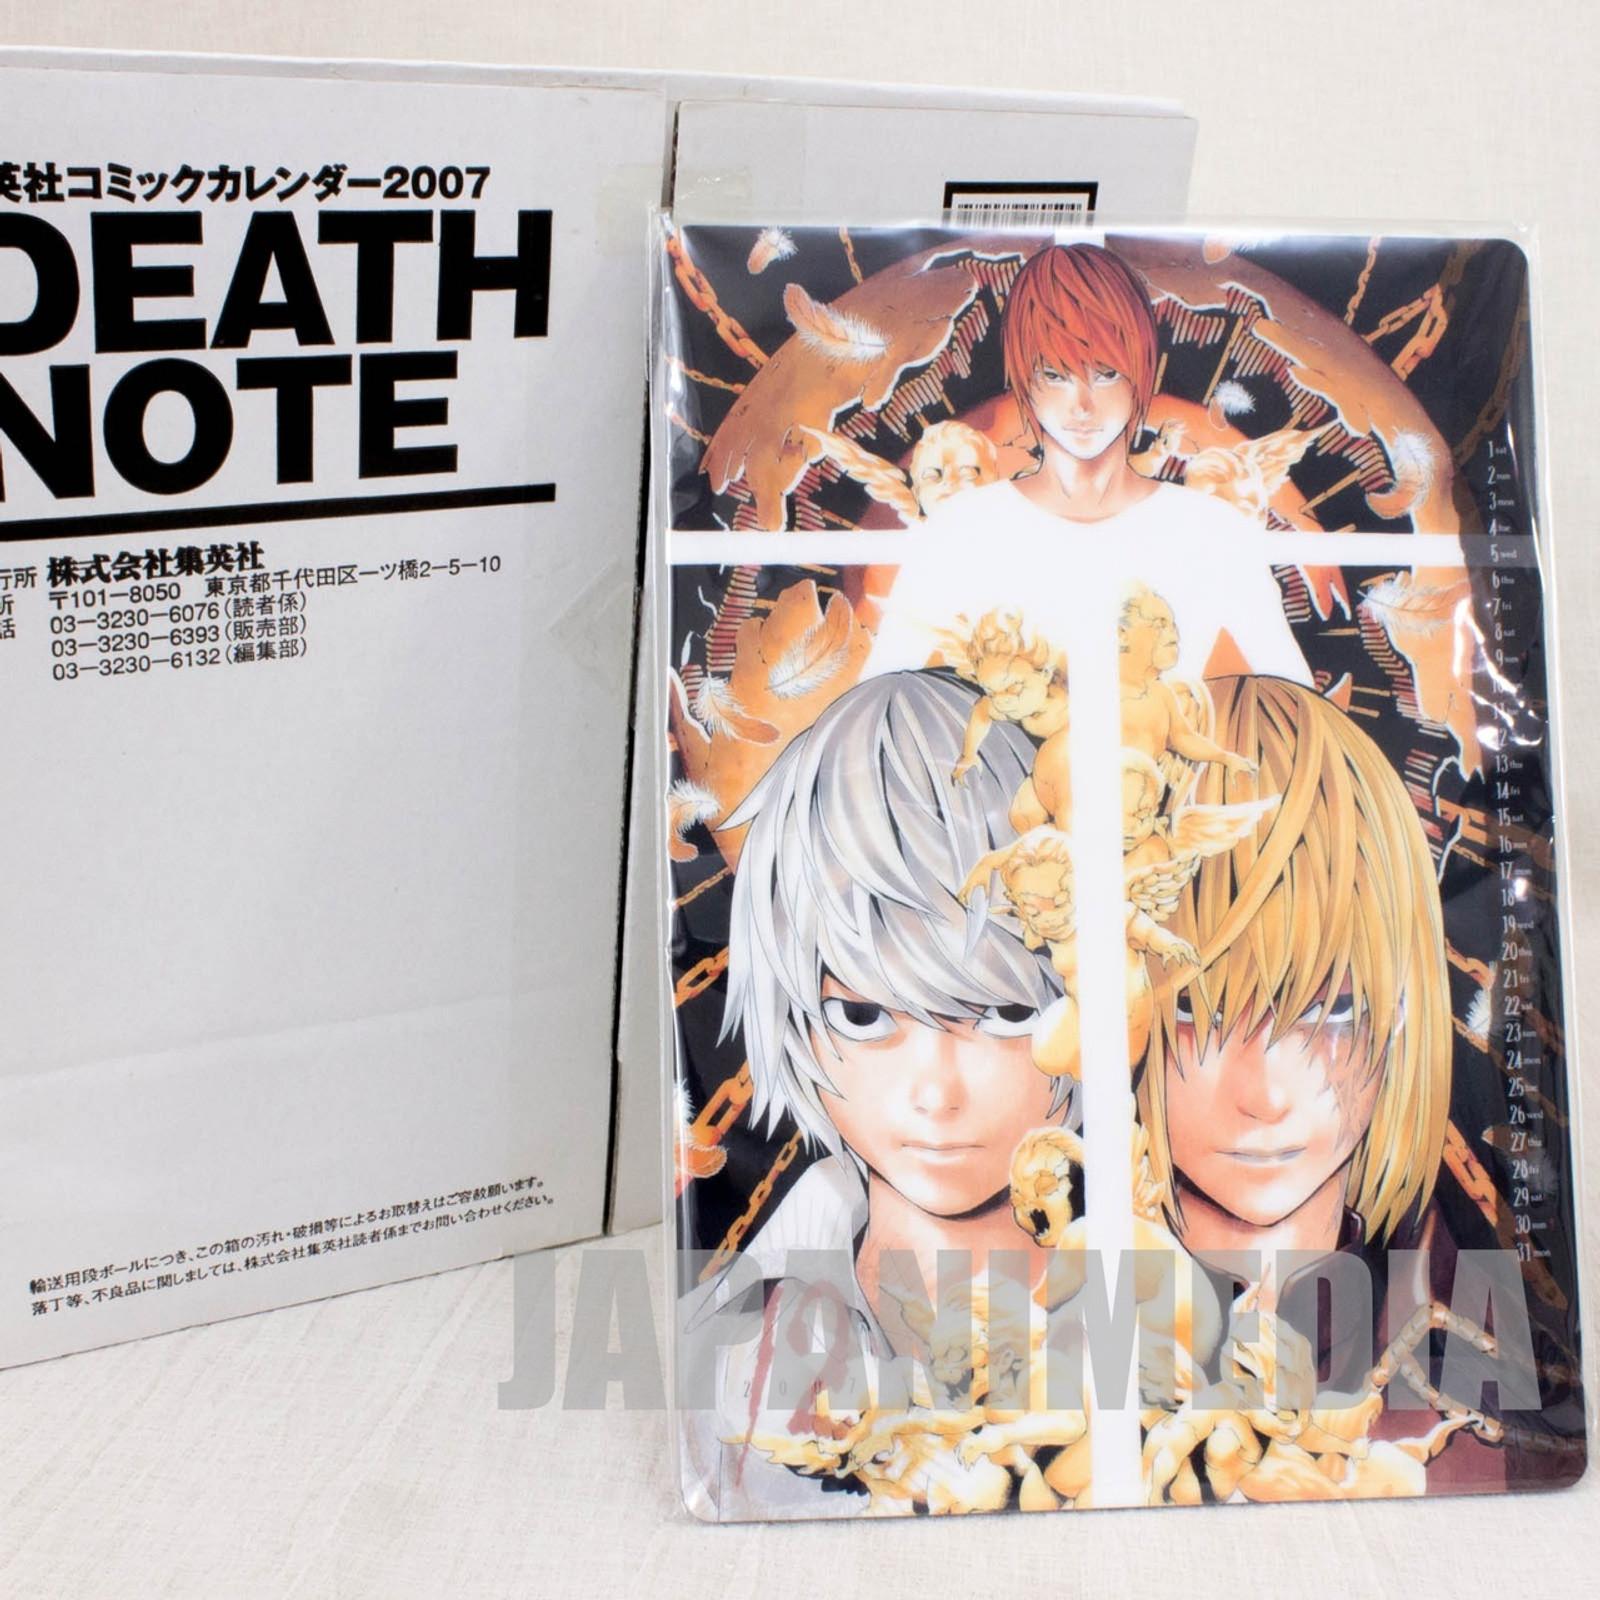 Death Note Plastic Card Calendar 2007 JAPAN ANIME MANGA SHONEN JUMP